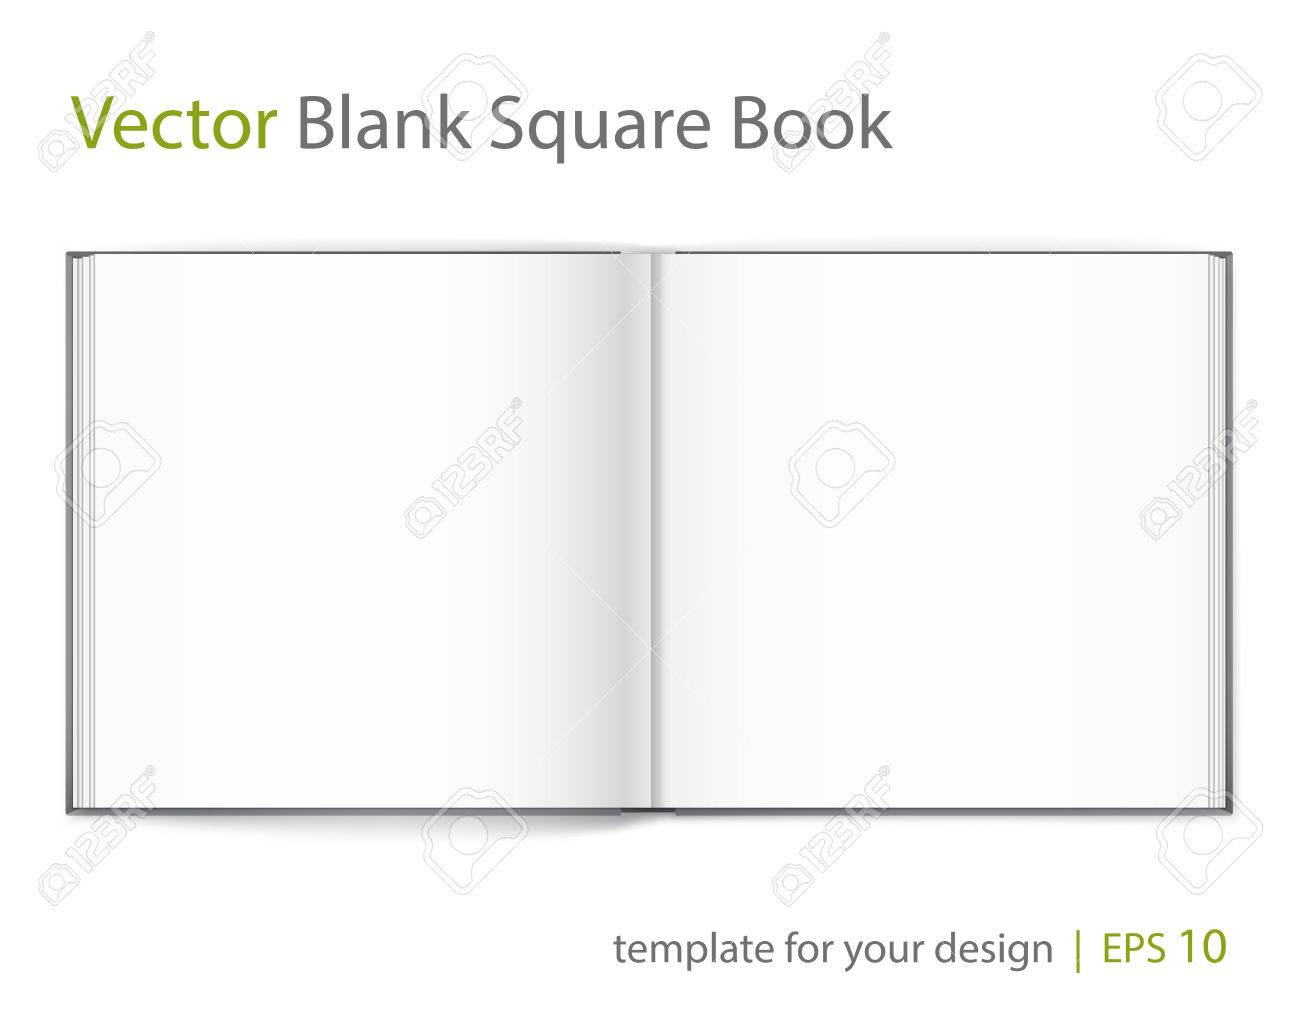 Vector blank of open magazine on white background. - 61723683